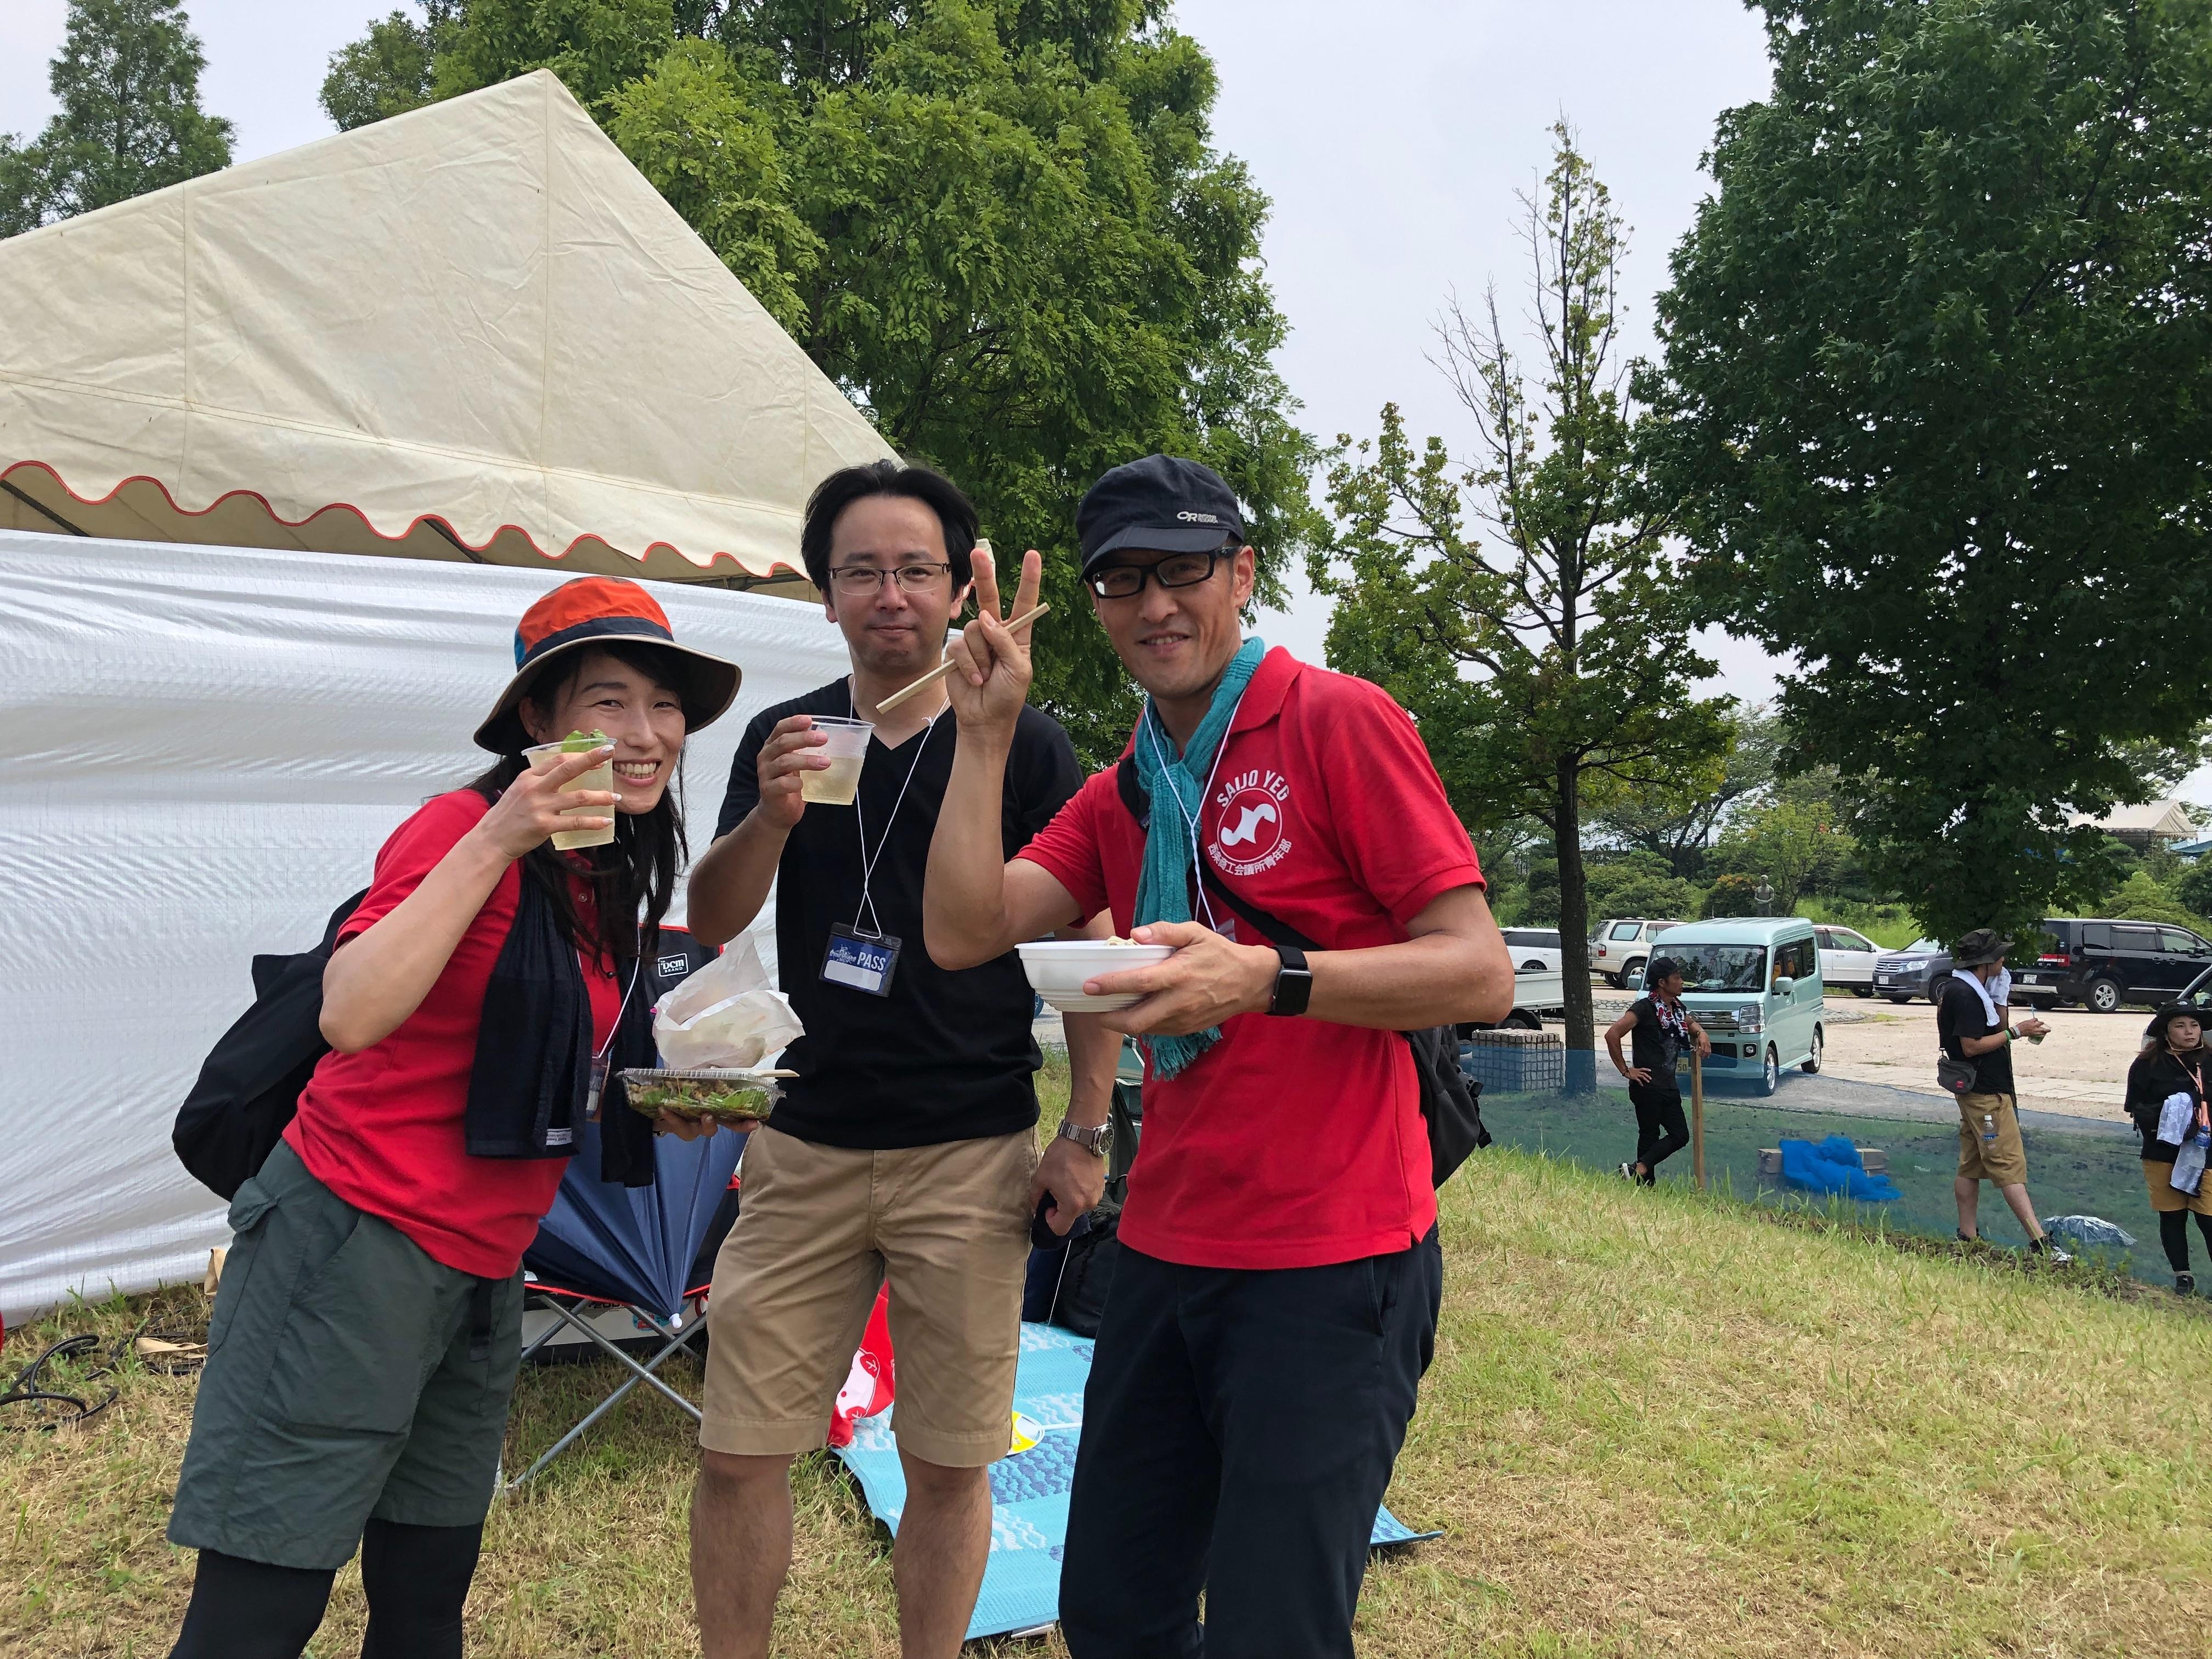 f:id:masanori-kato1972:20190729193830j:image